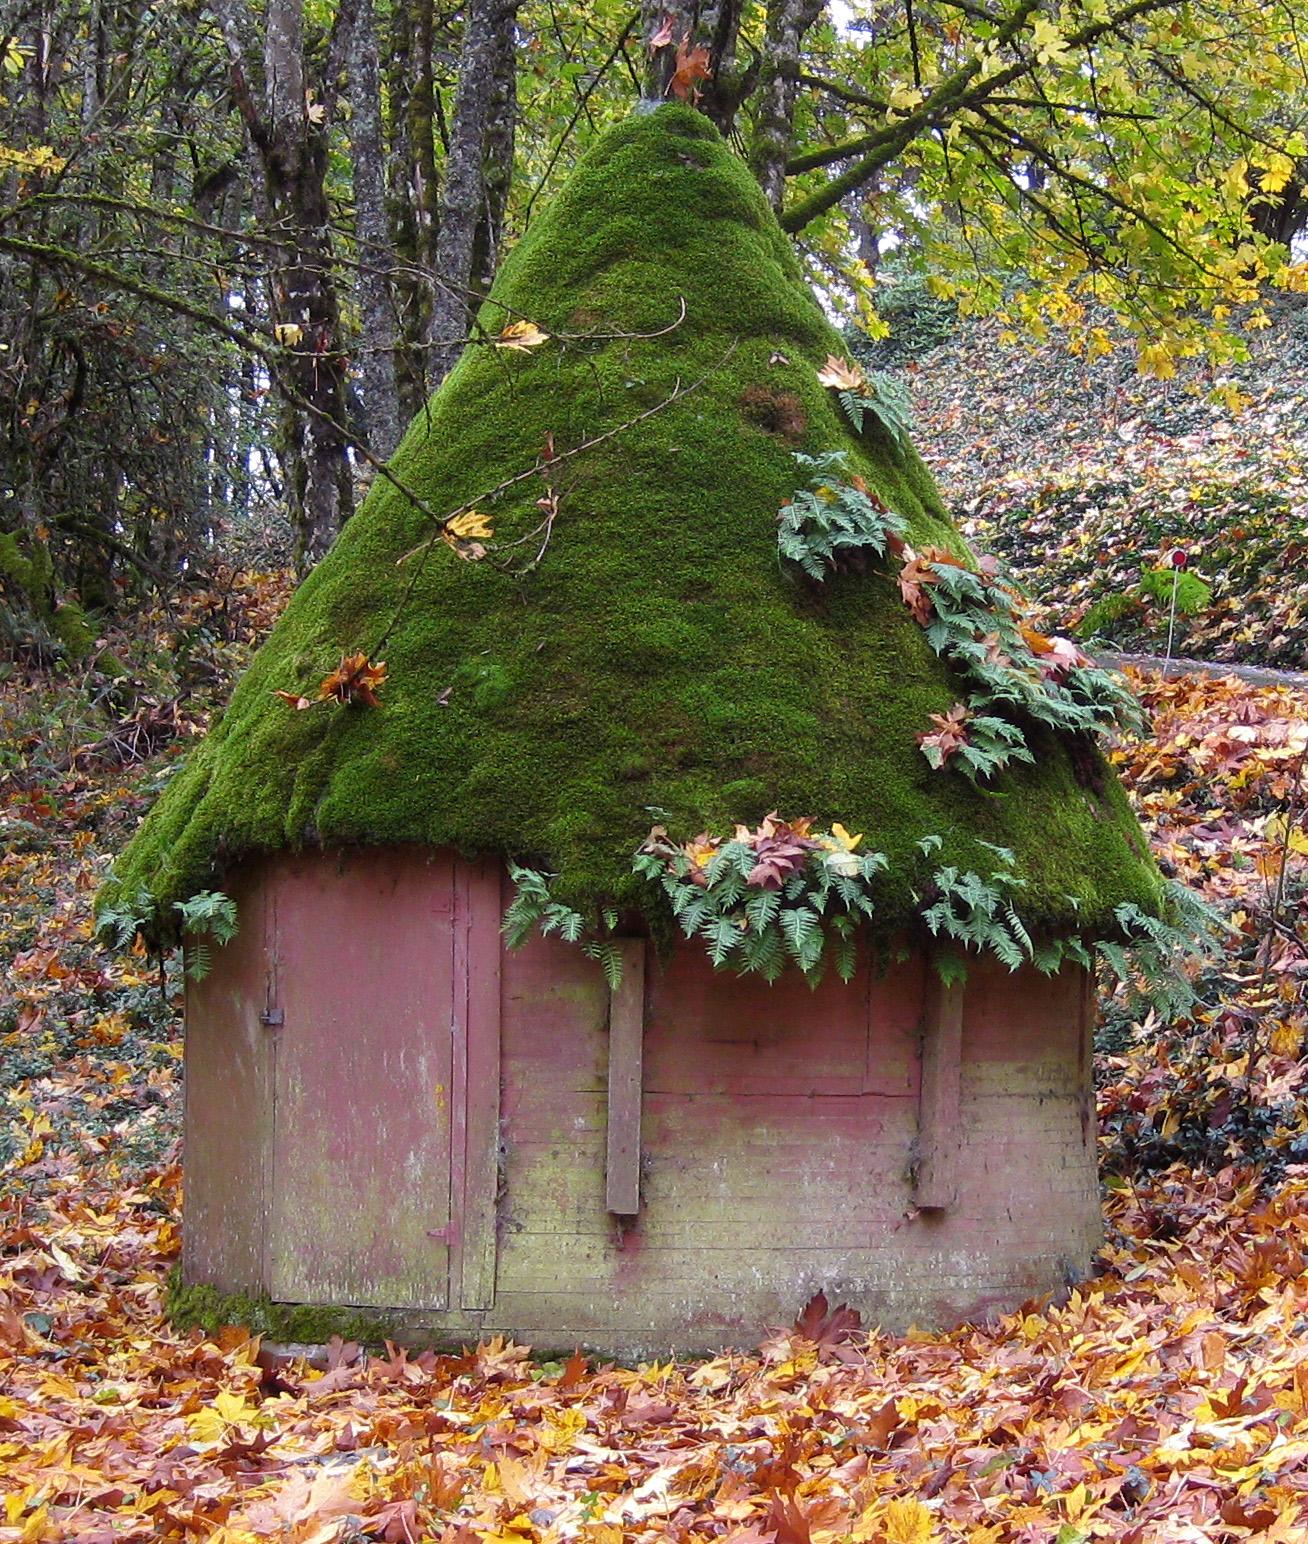 moss-hut-close-up